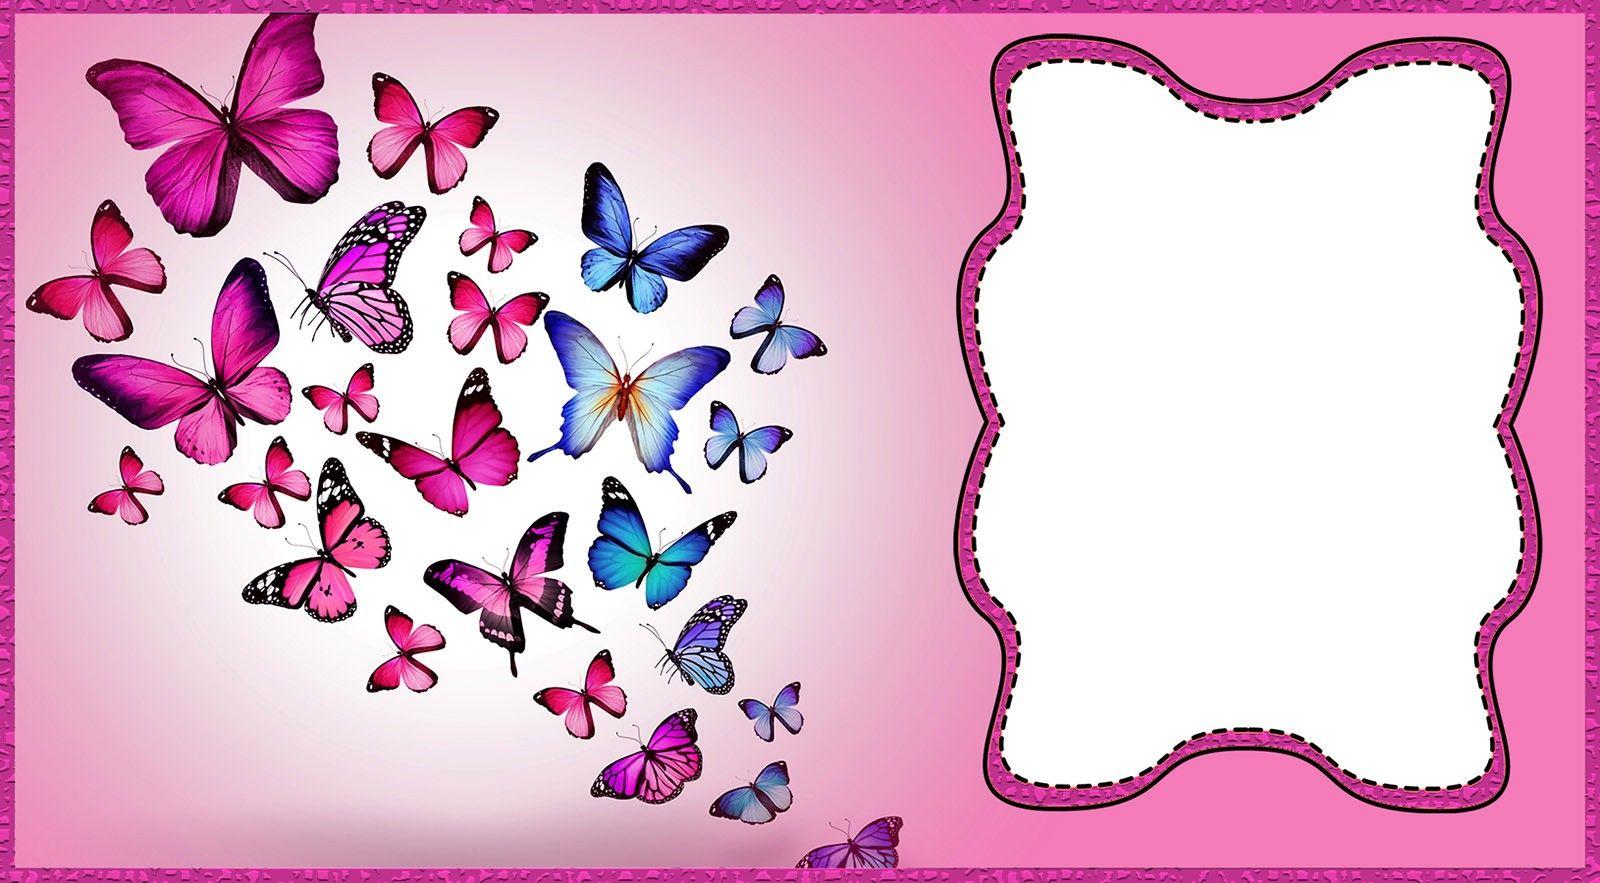 Printable Butterfly Birthday Invitation Butterfly Birthday Invitations Butterfly Invitations Butterfly Party Invitations